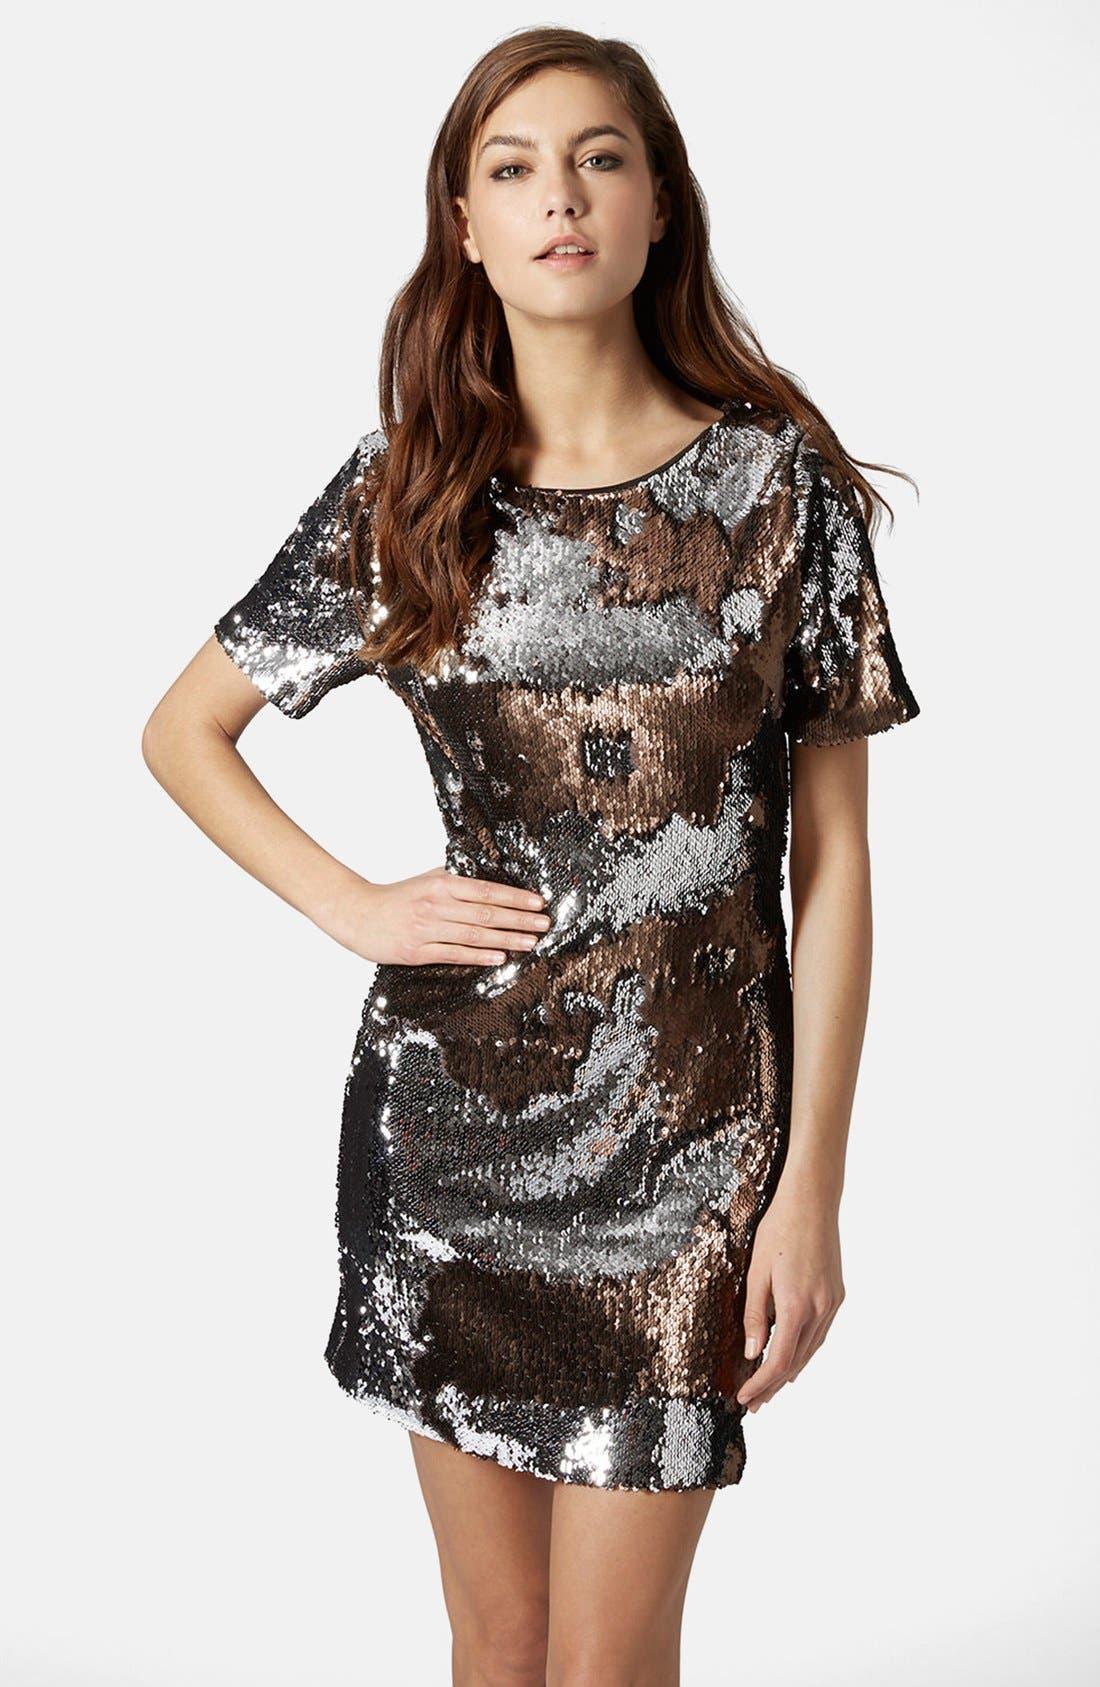 Alternate Image 1 Selected - Topshop Metallic Sequin Body-Con Dress (Regular & Petite)